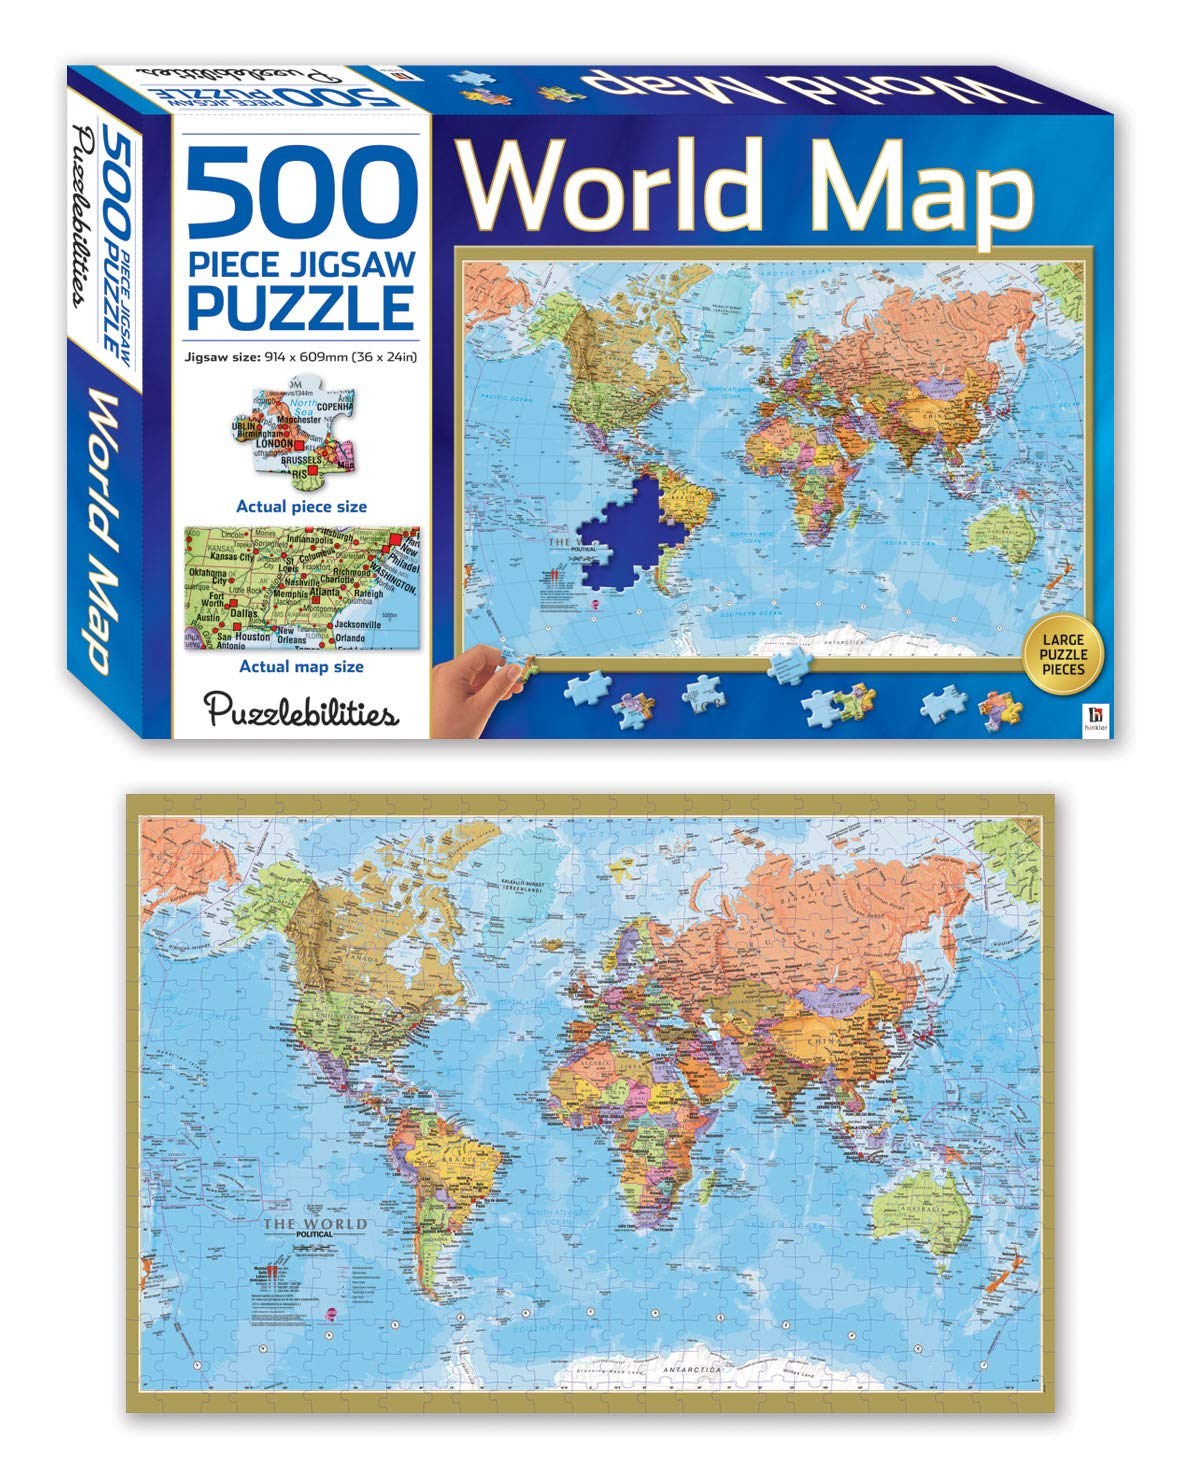 World Map 500 Piece Jigsaw Puzzle Puzzlebilities Amazon In Books